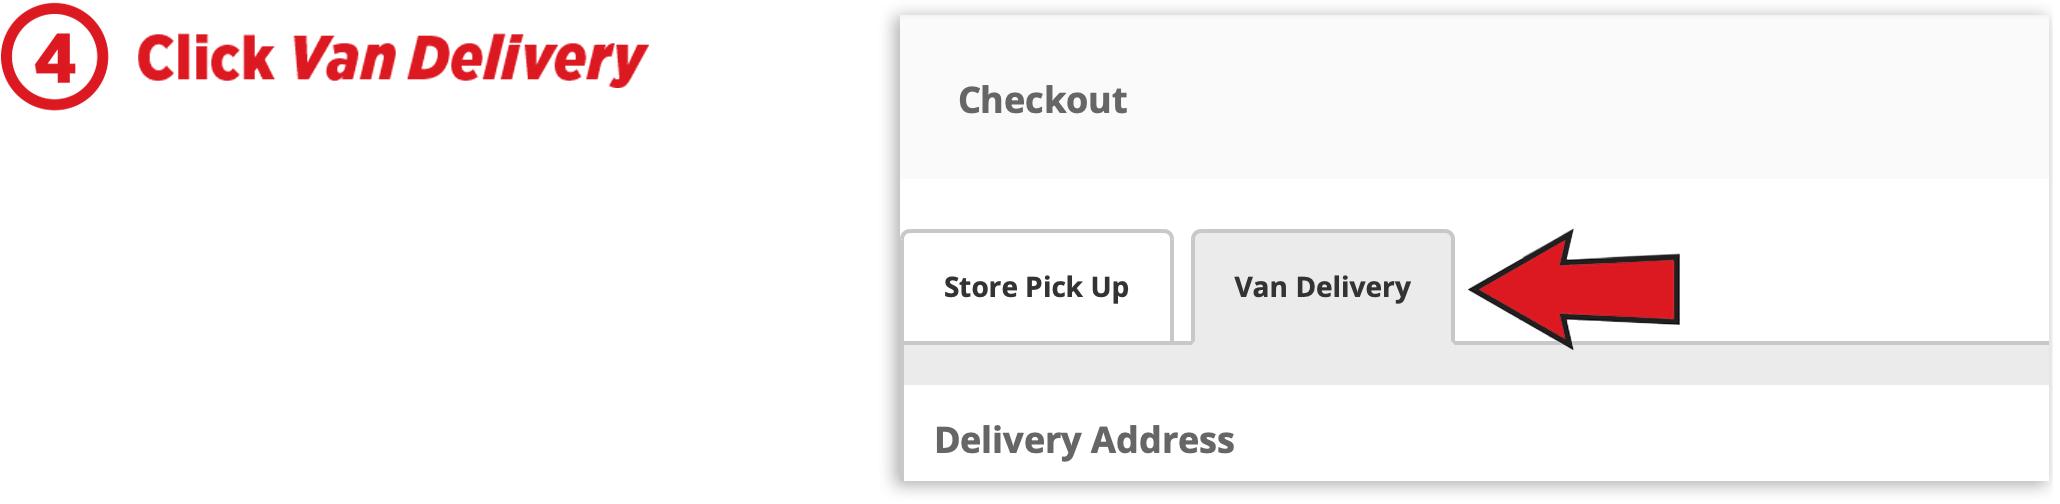 Click Van Delivery